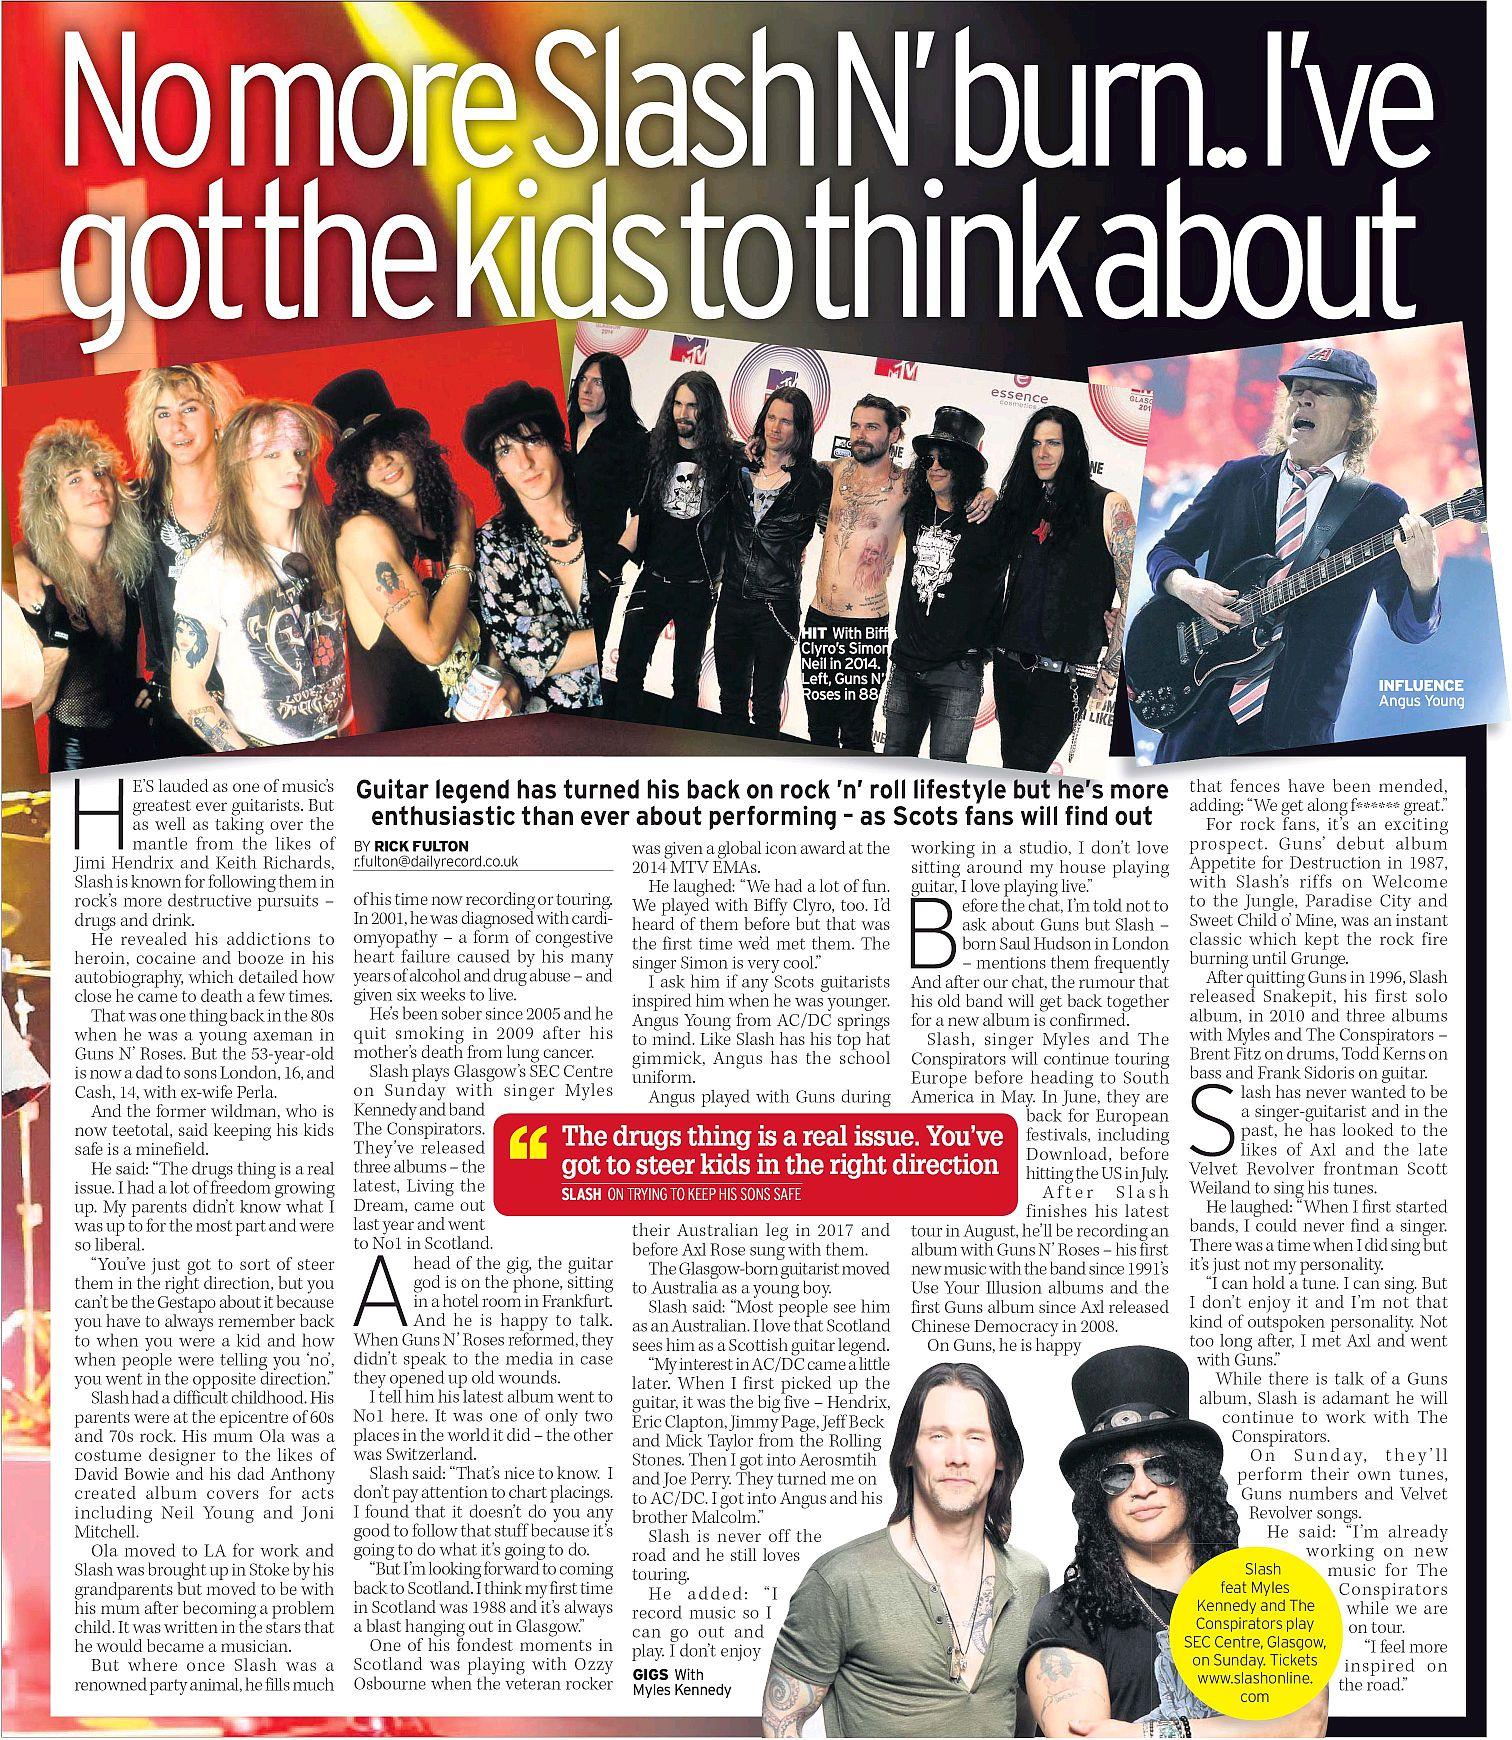 2019.02.15 - Scottish Daily Record - No more Slash N' burn (Slash) VHlURUSL_o